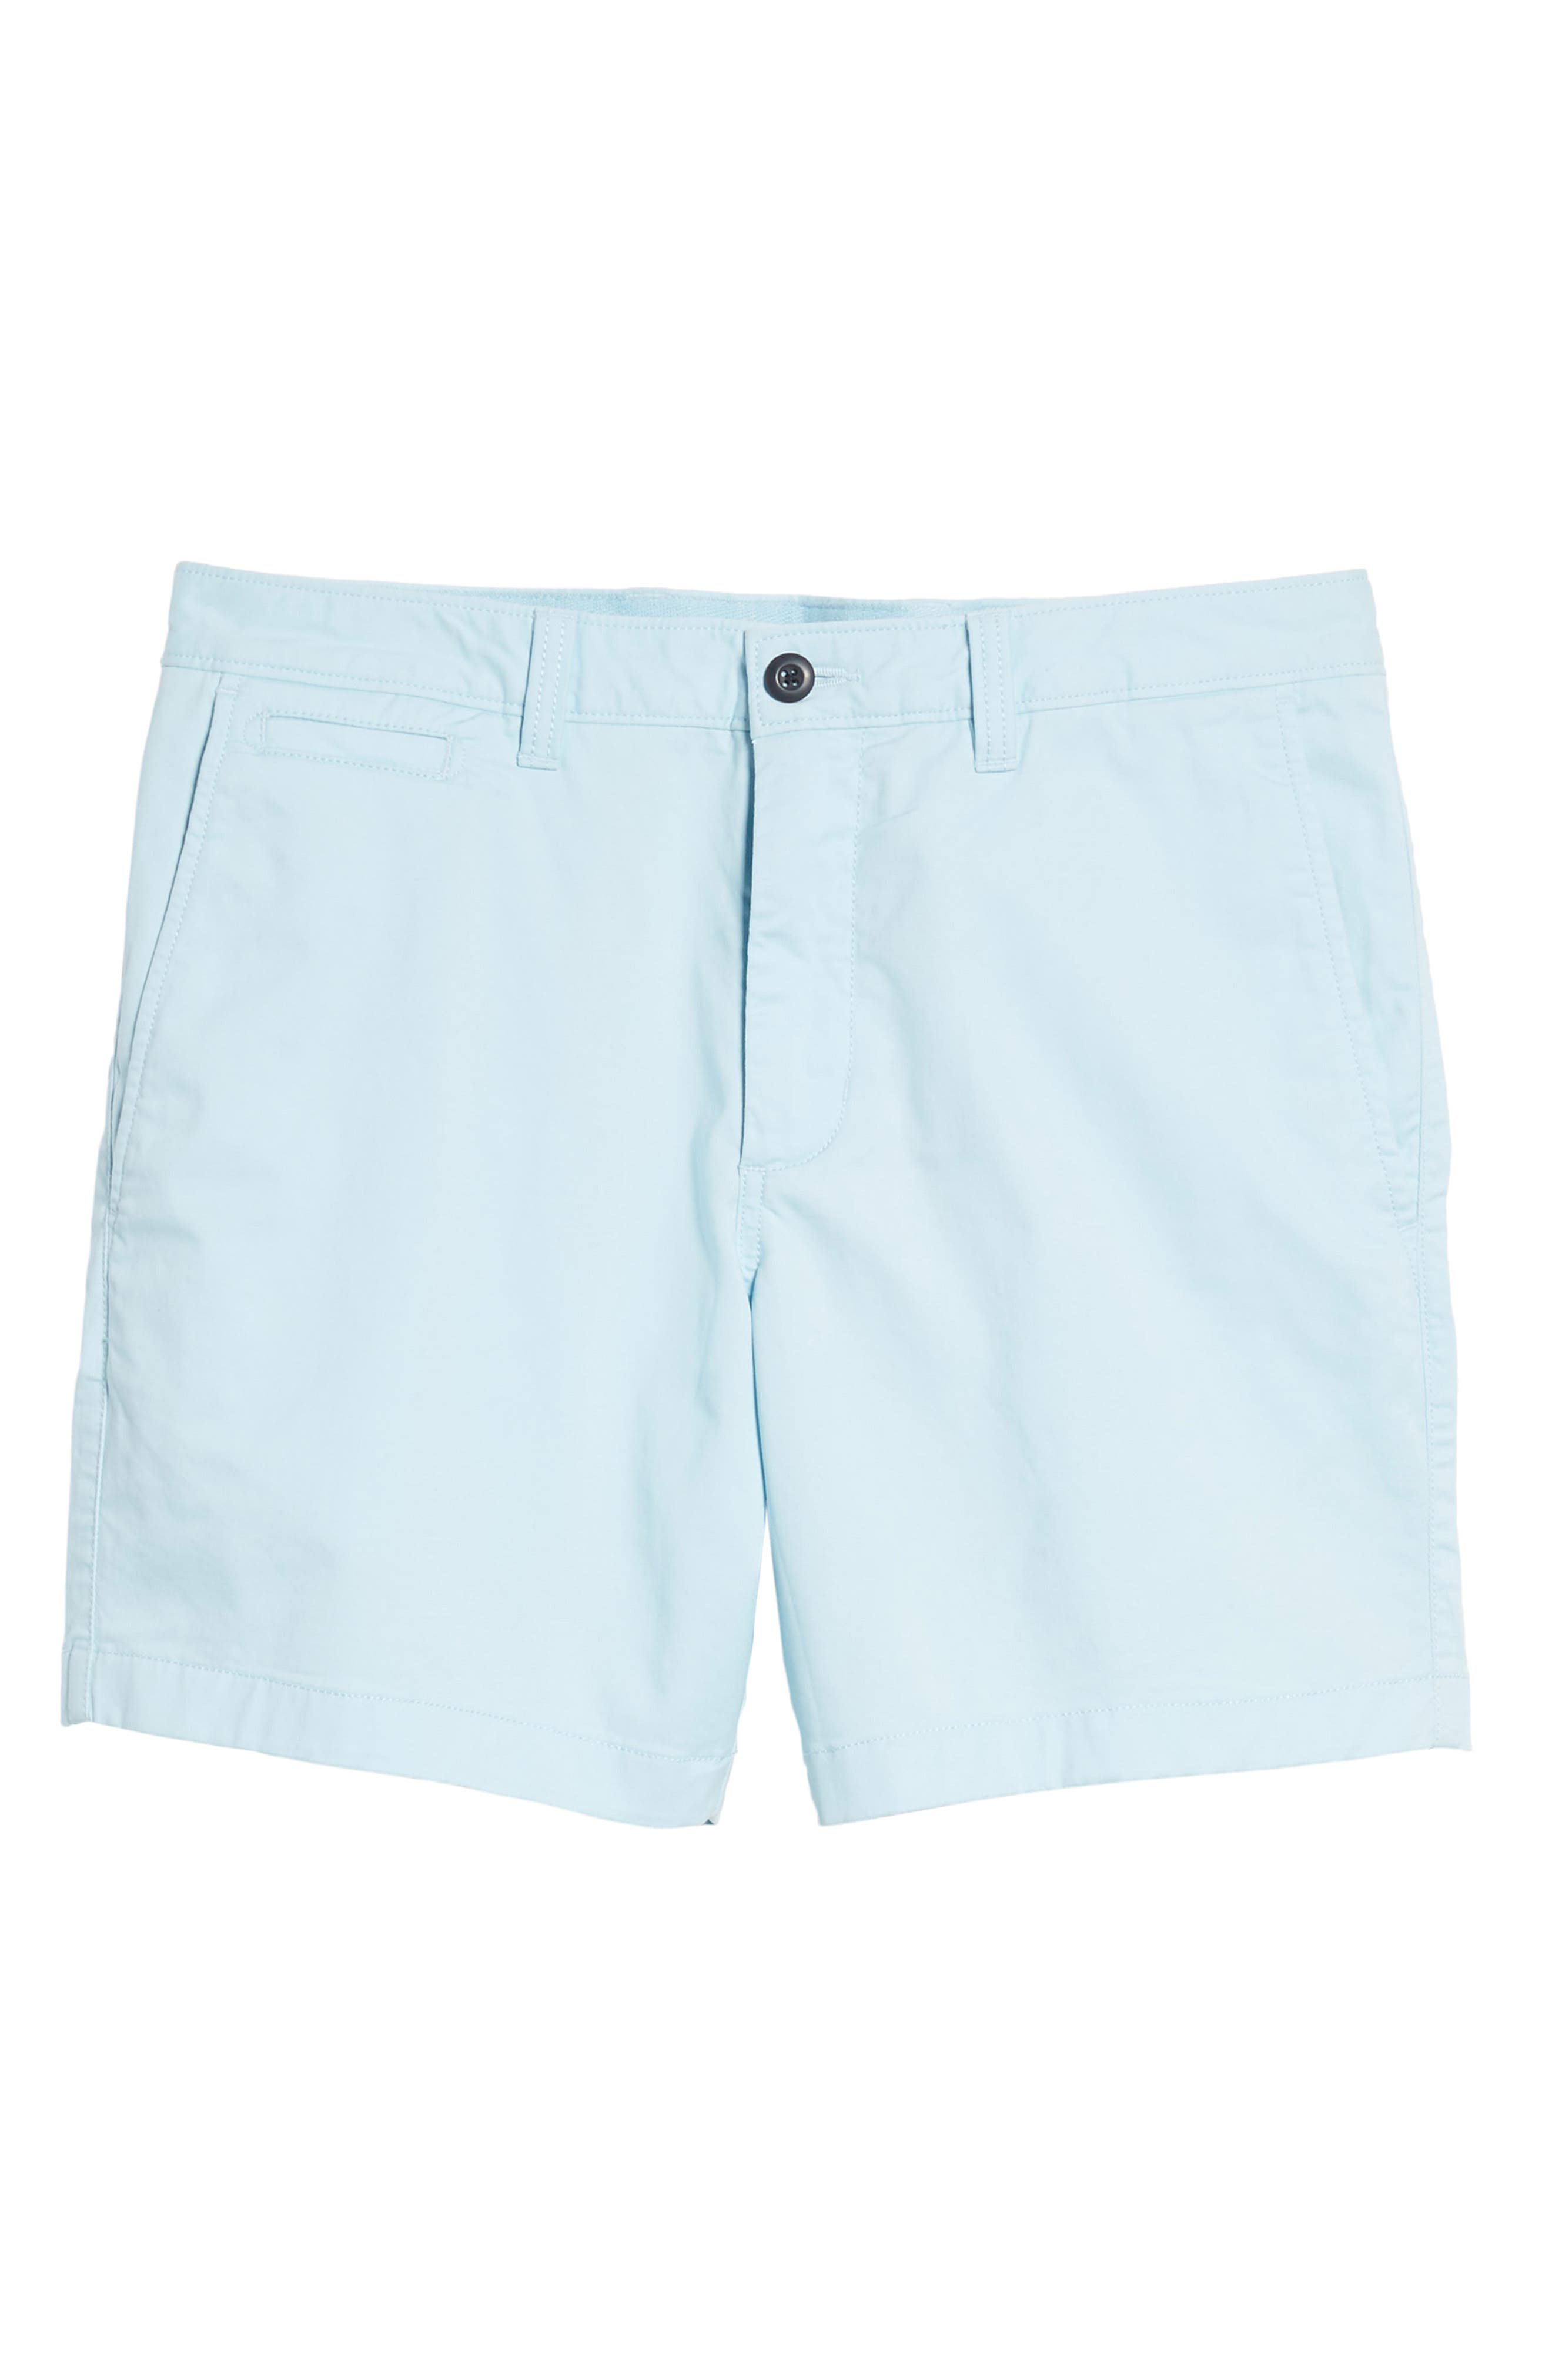 Ballard Slim Fit Stretch Chino 7-Inch Shorts,                             Alternate thumbnail 70, color,